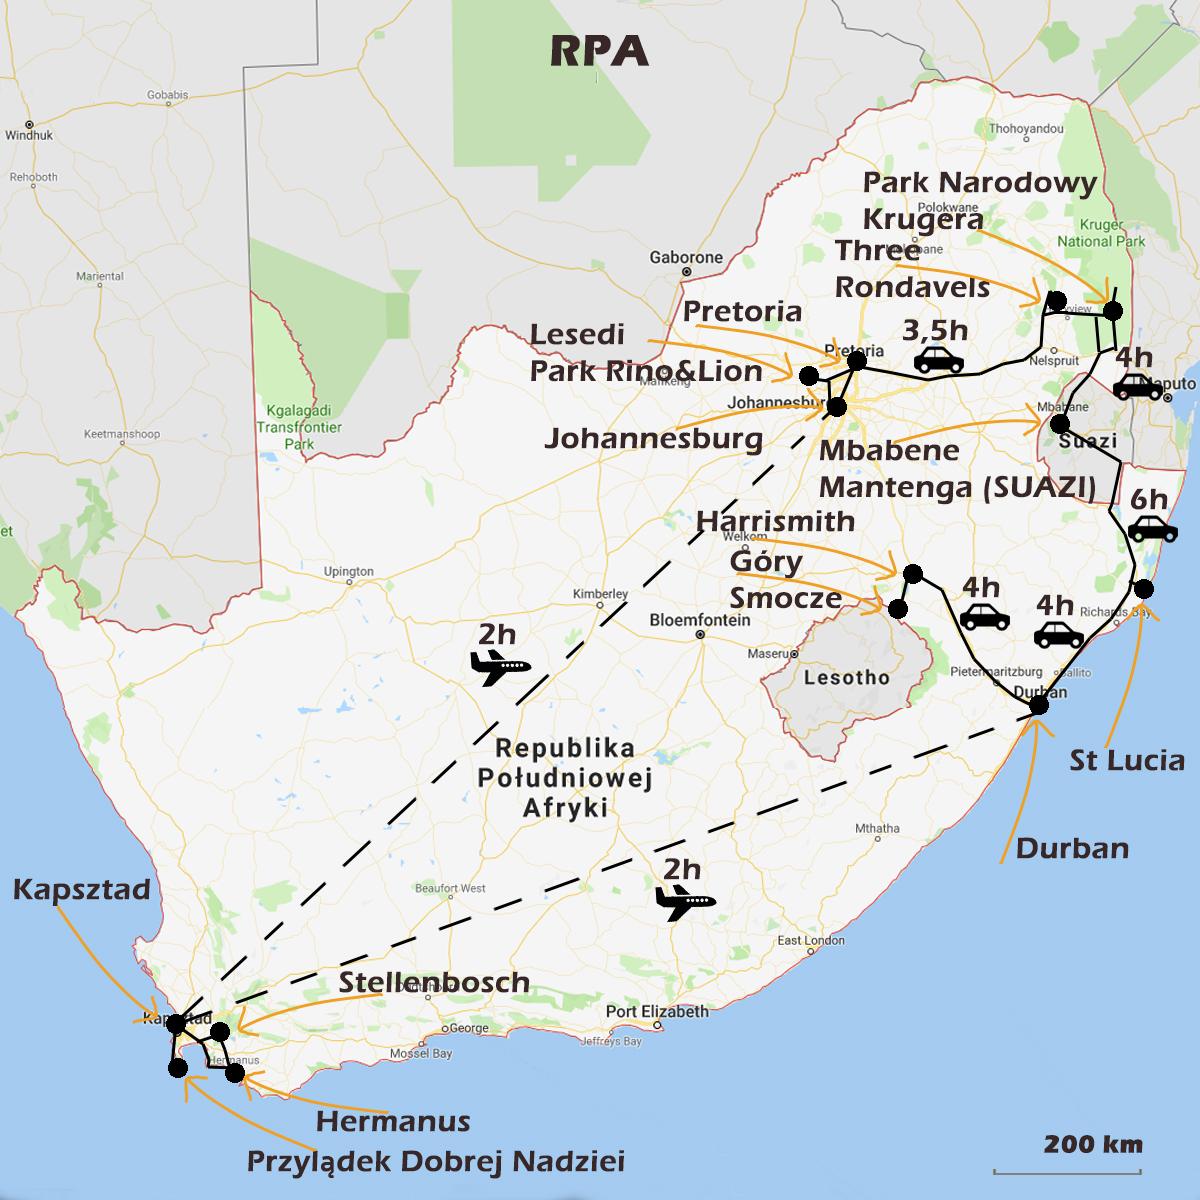 01 rpa mapa - RPA- informacje ogólne